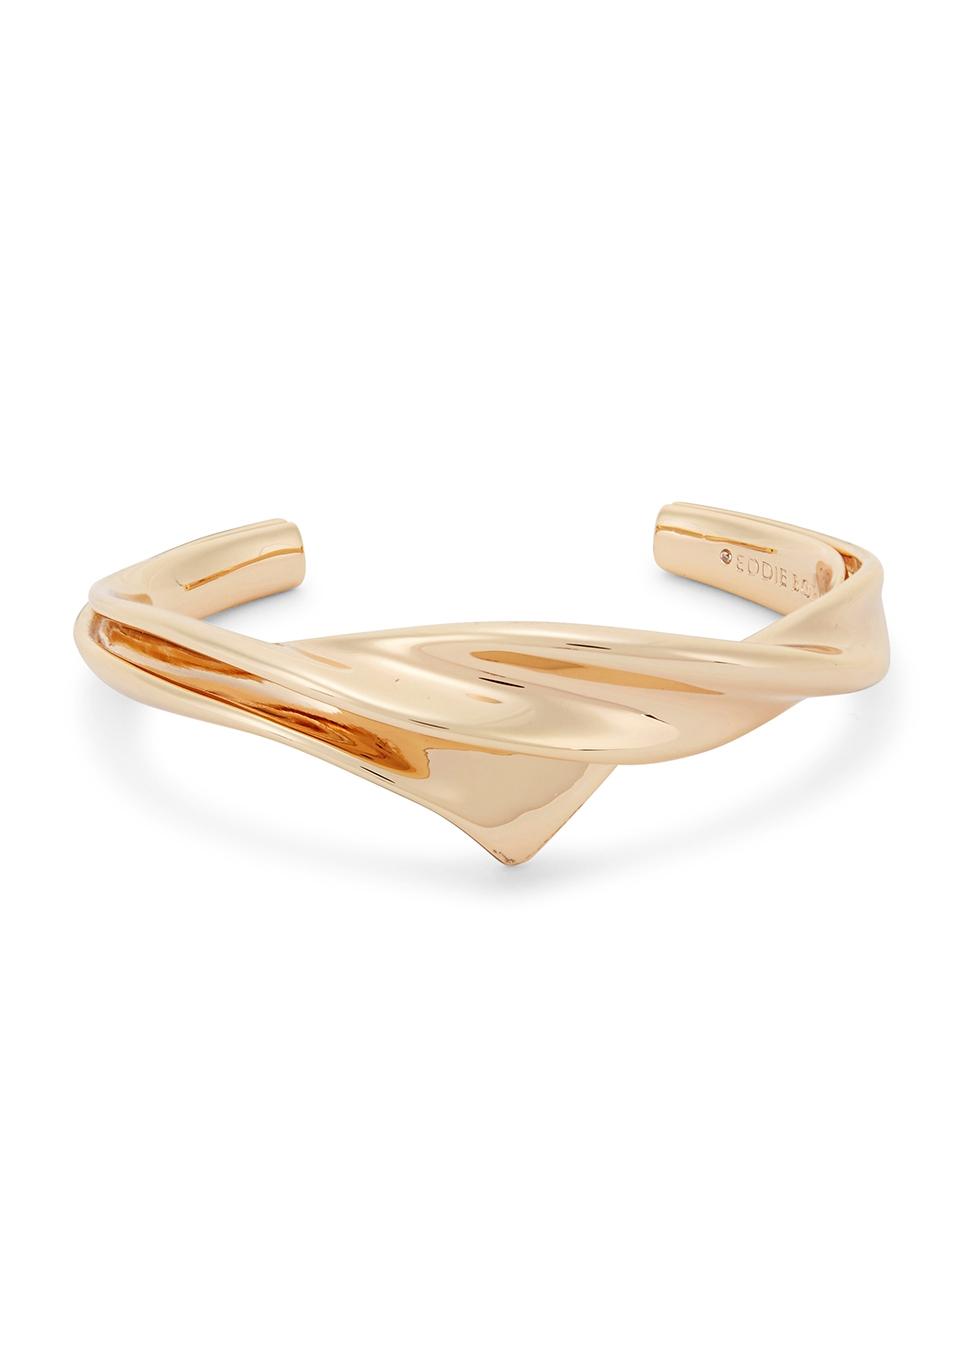 Kerchief Gold-Plated Sculpted Cuff